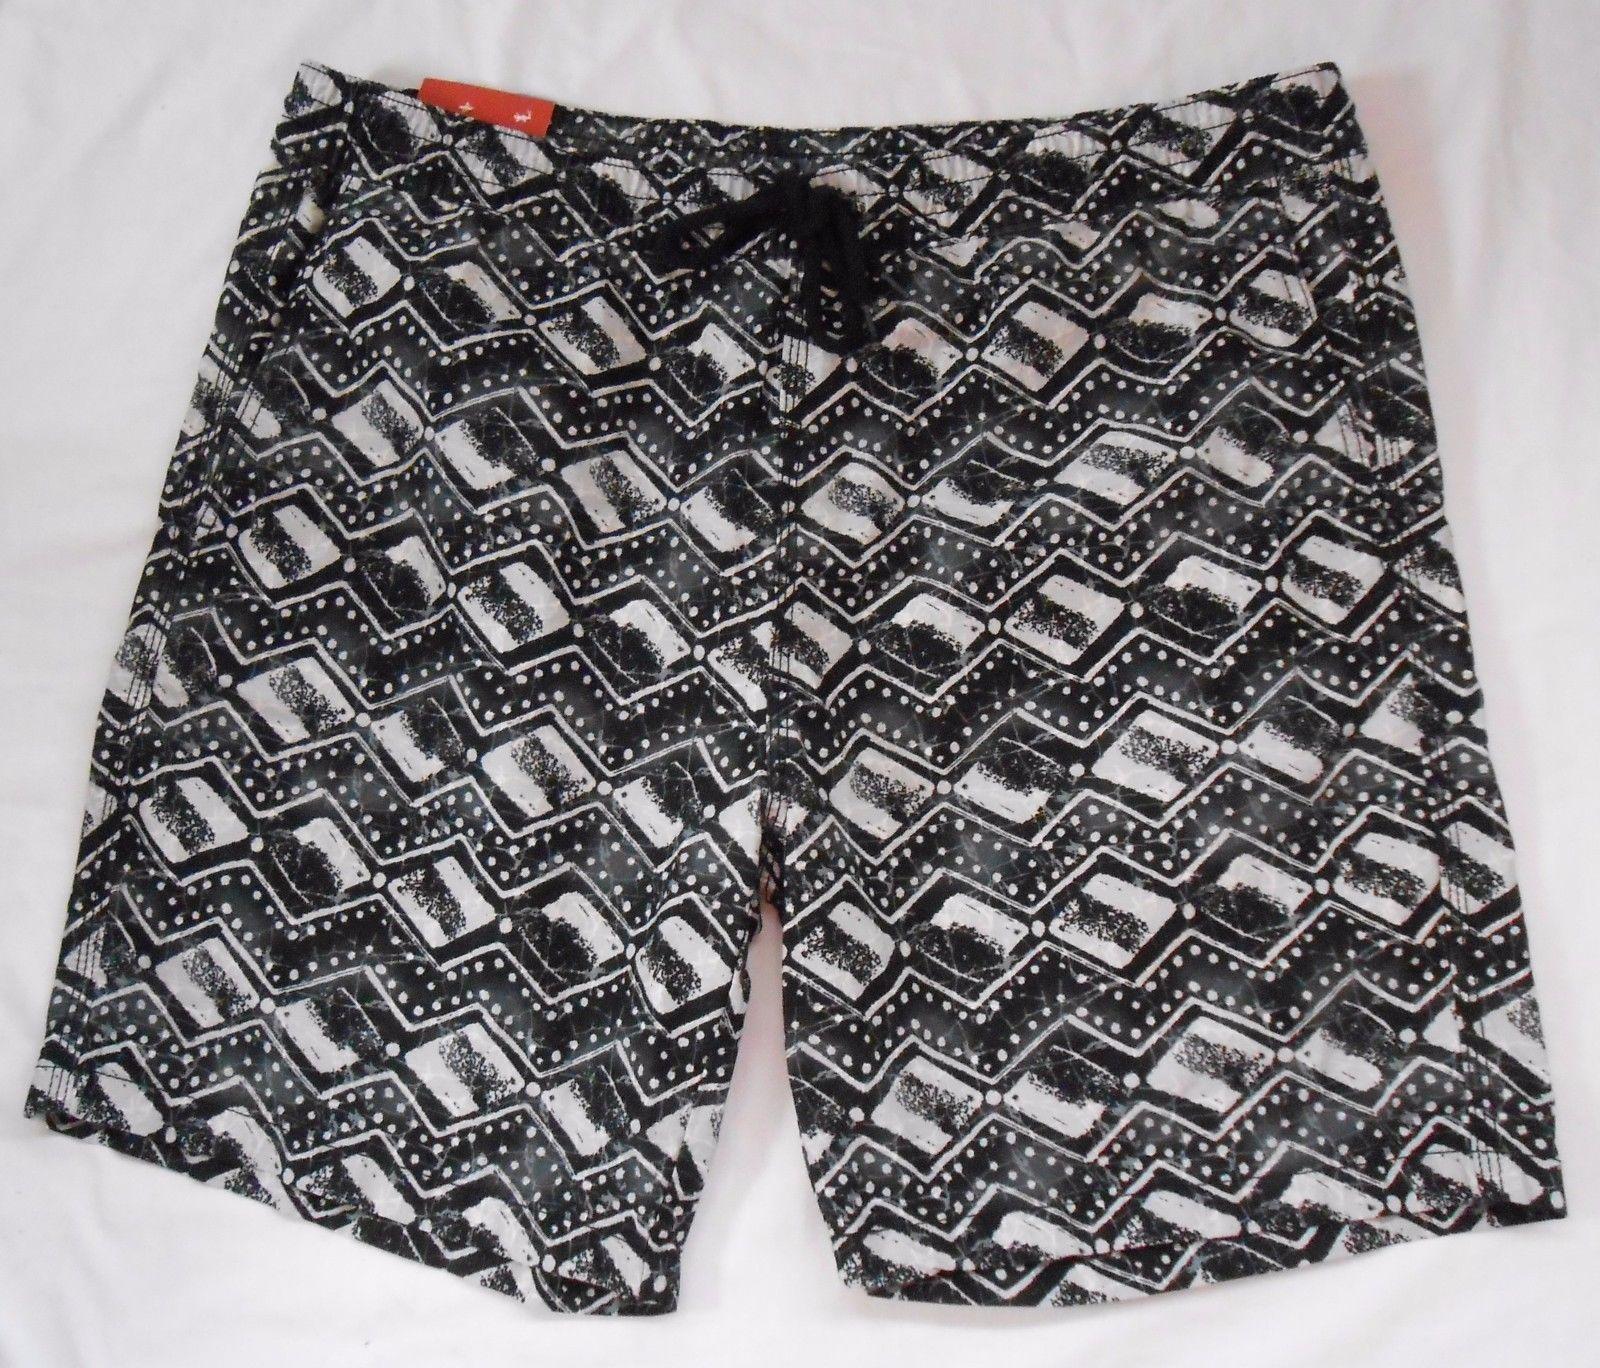 Mossimo NWT Mens Swim Trunks L Black White Abstract Geometric Shorts